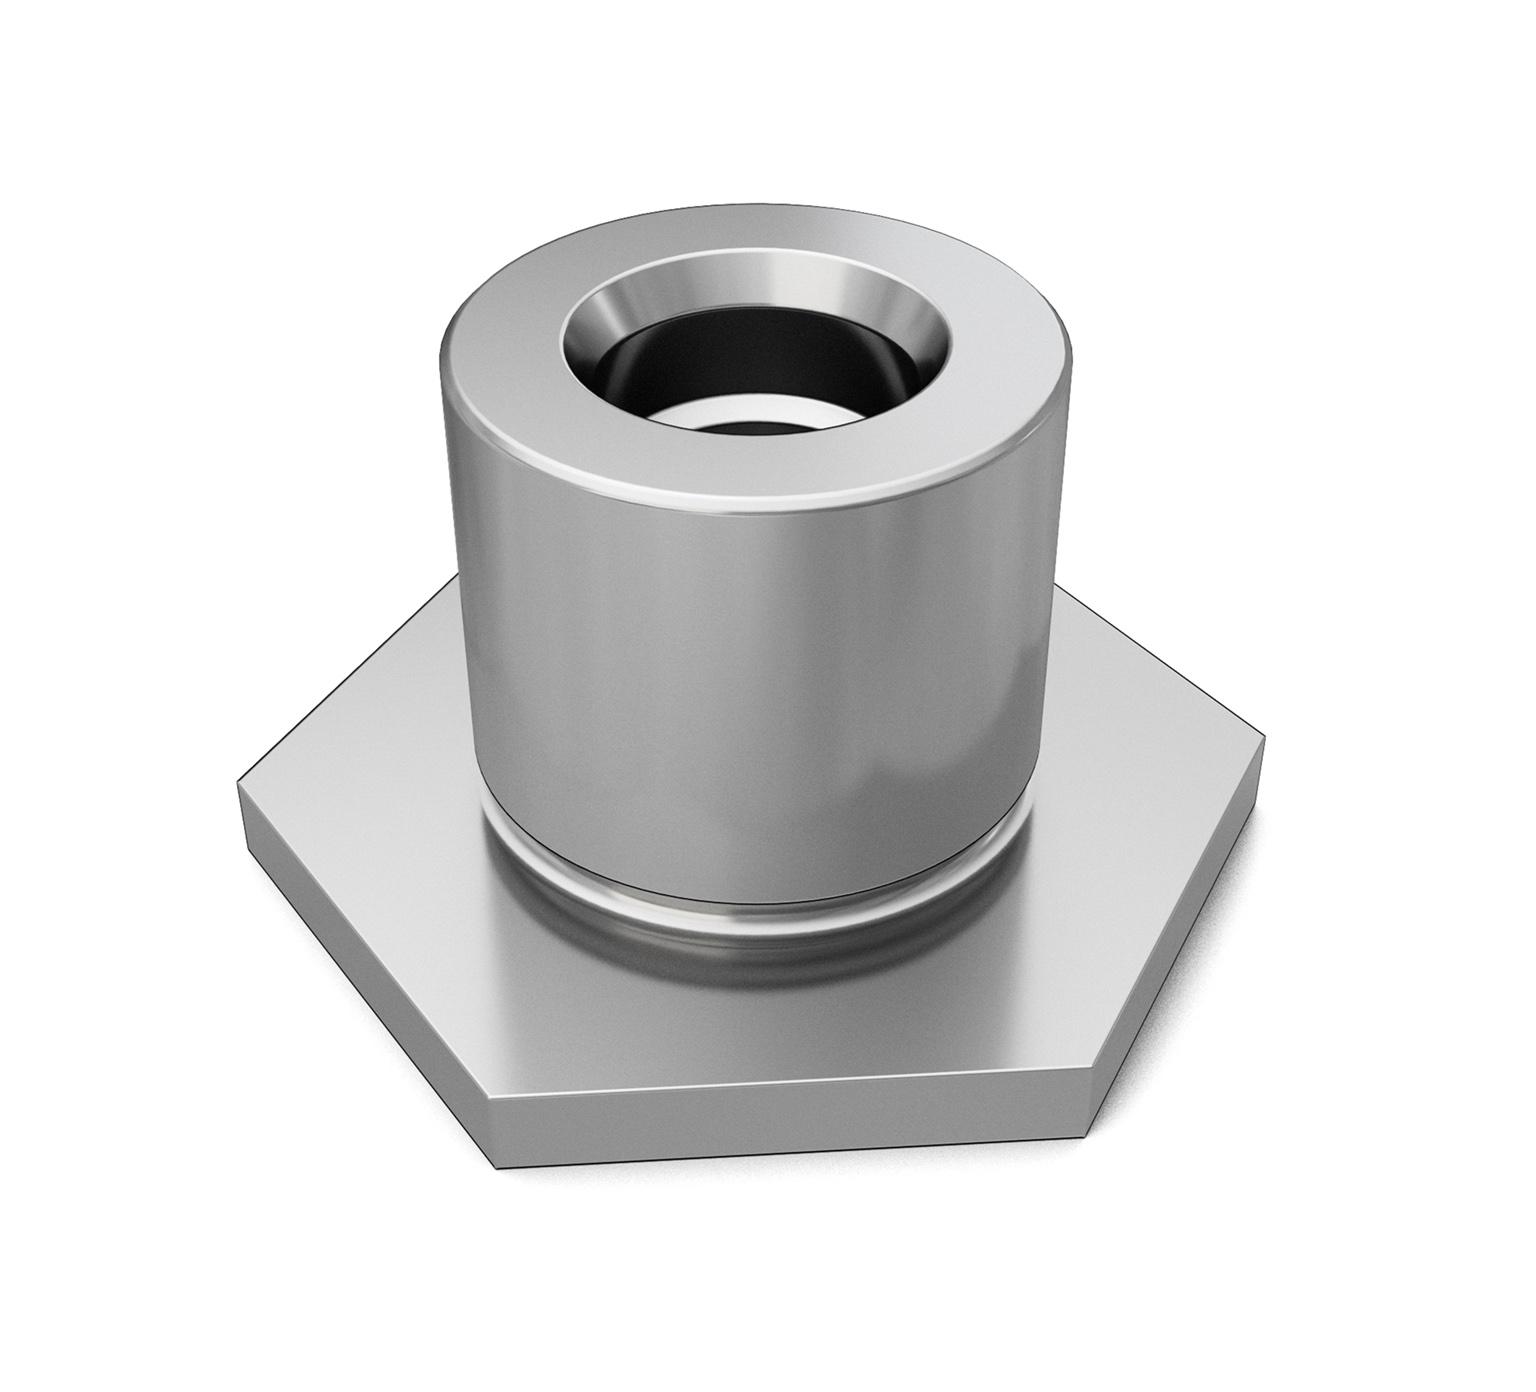 Tennanttrue Steel Hex Flange Bushing 1 X 0 629 In Pn